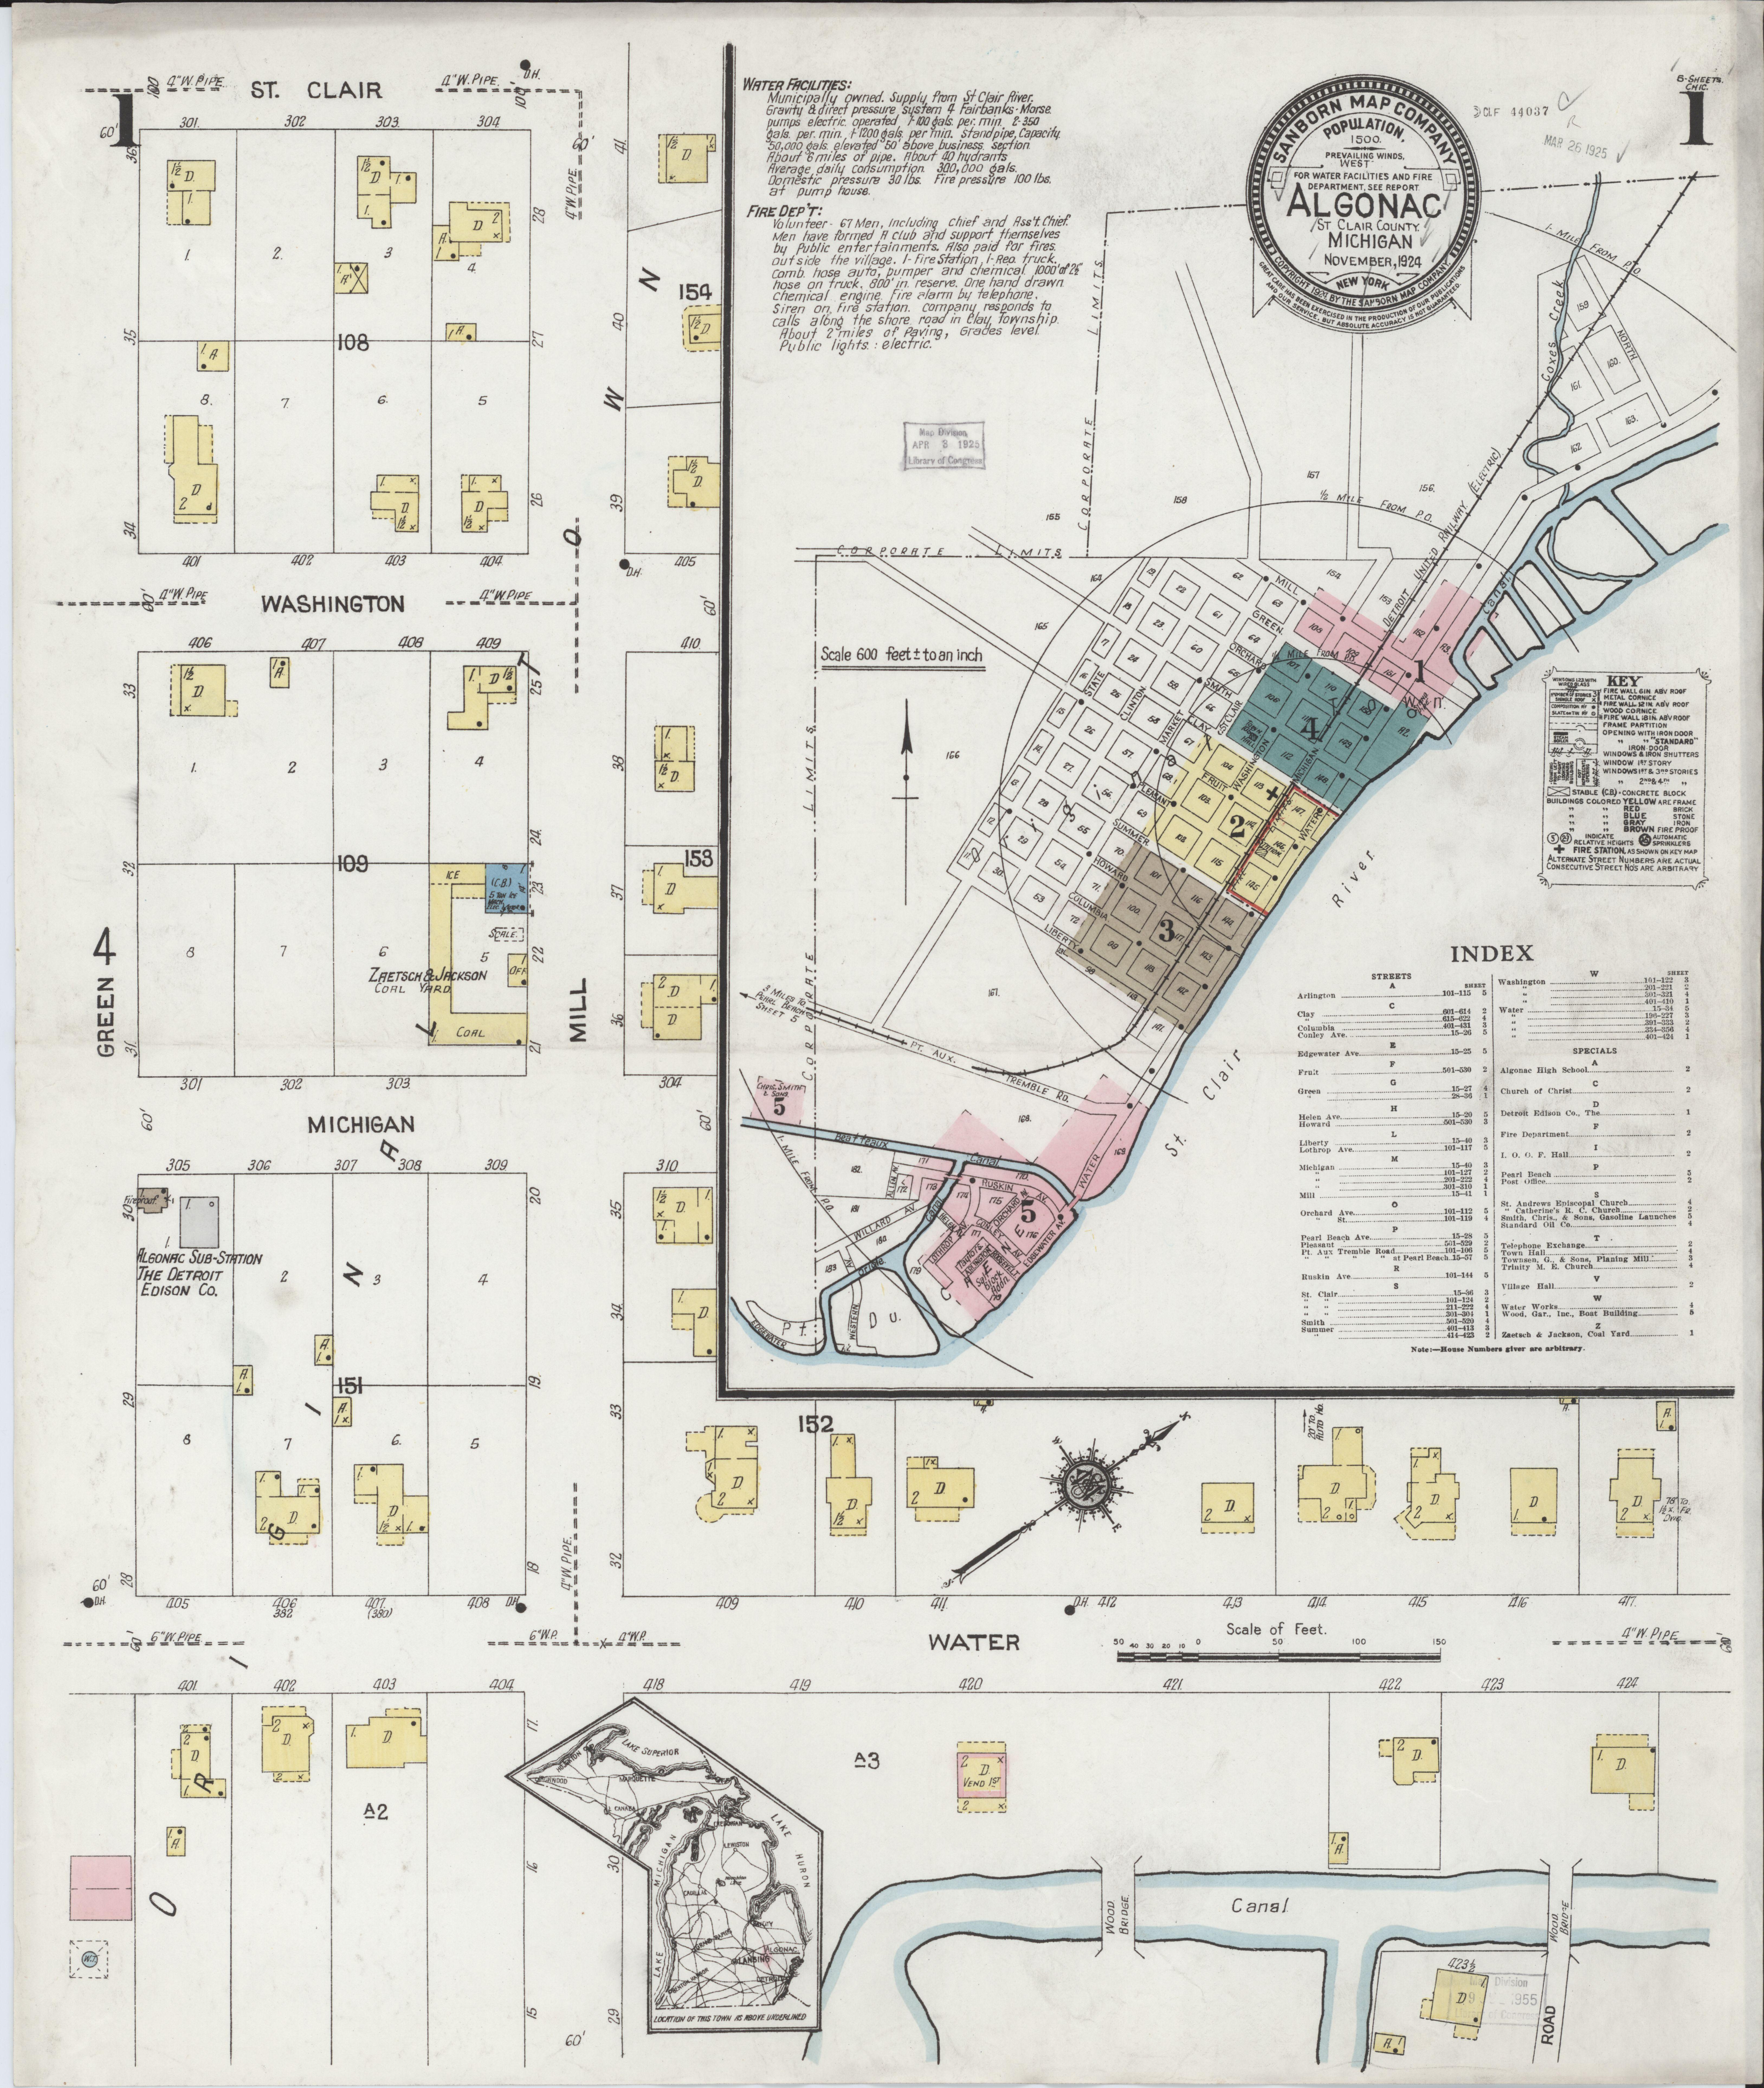 Algonac Michigan Map.File Sanborn Fire Insurance Map From Algonac Saint Clair County